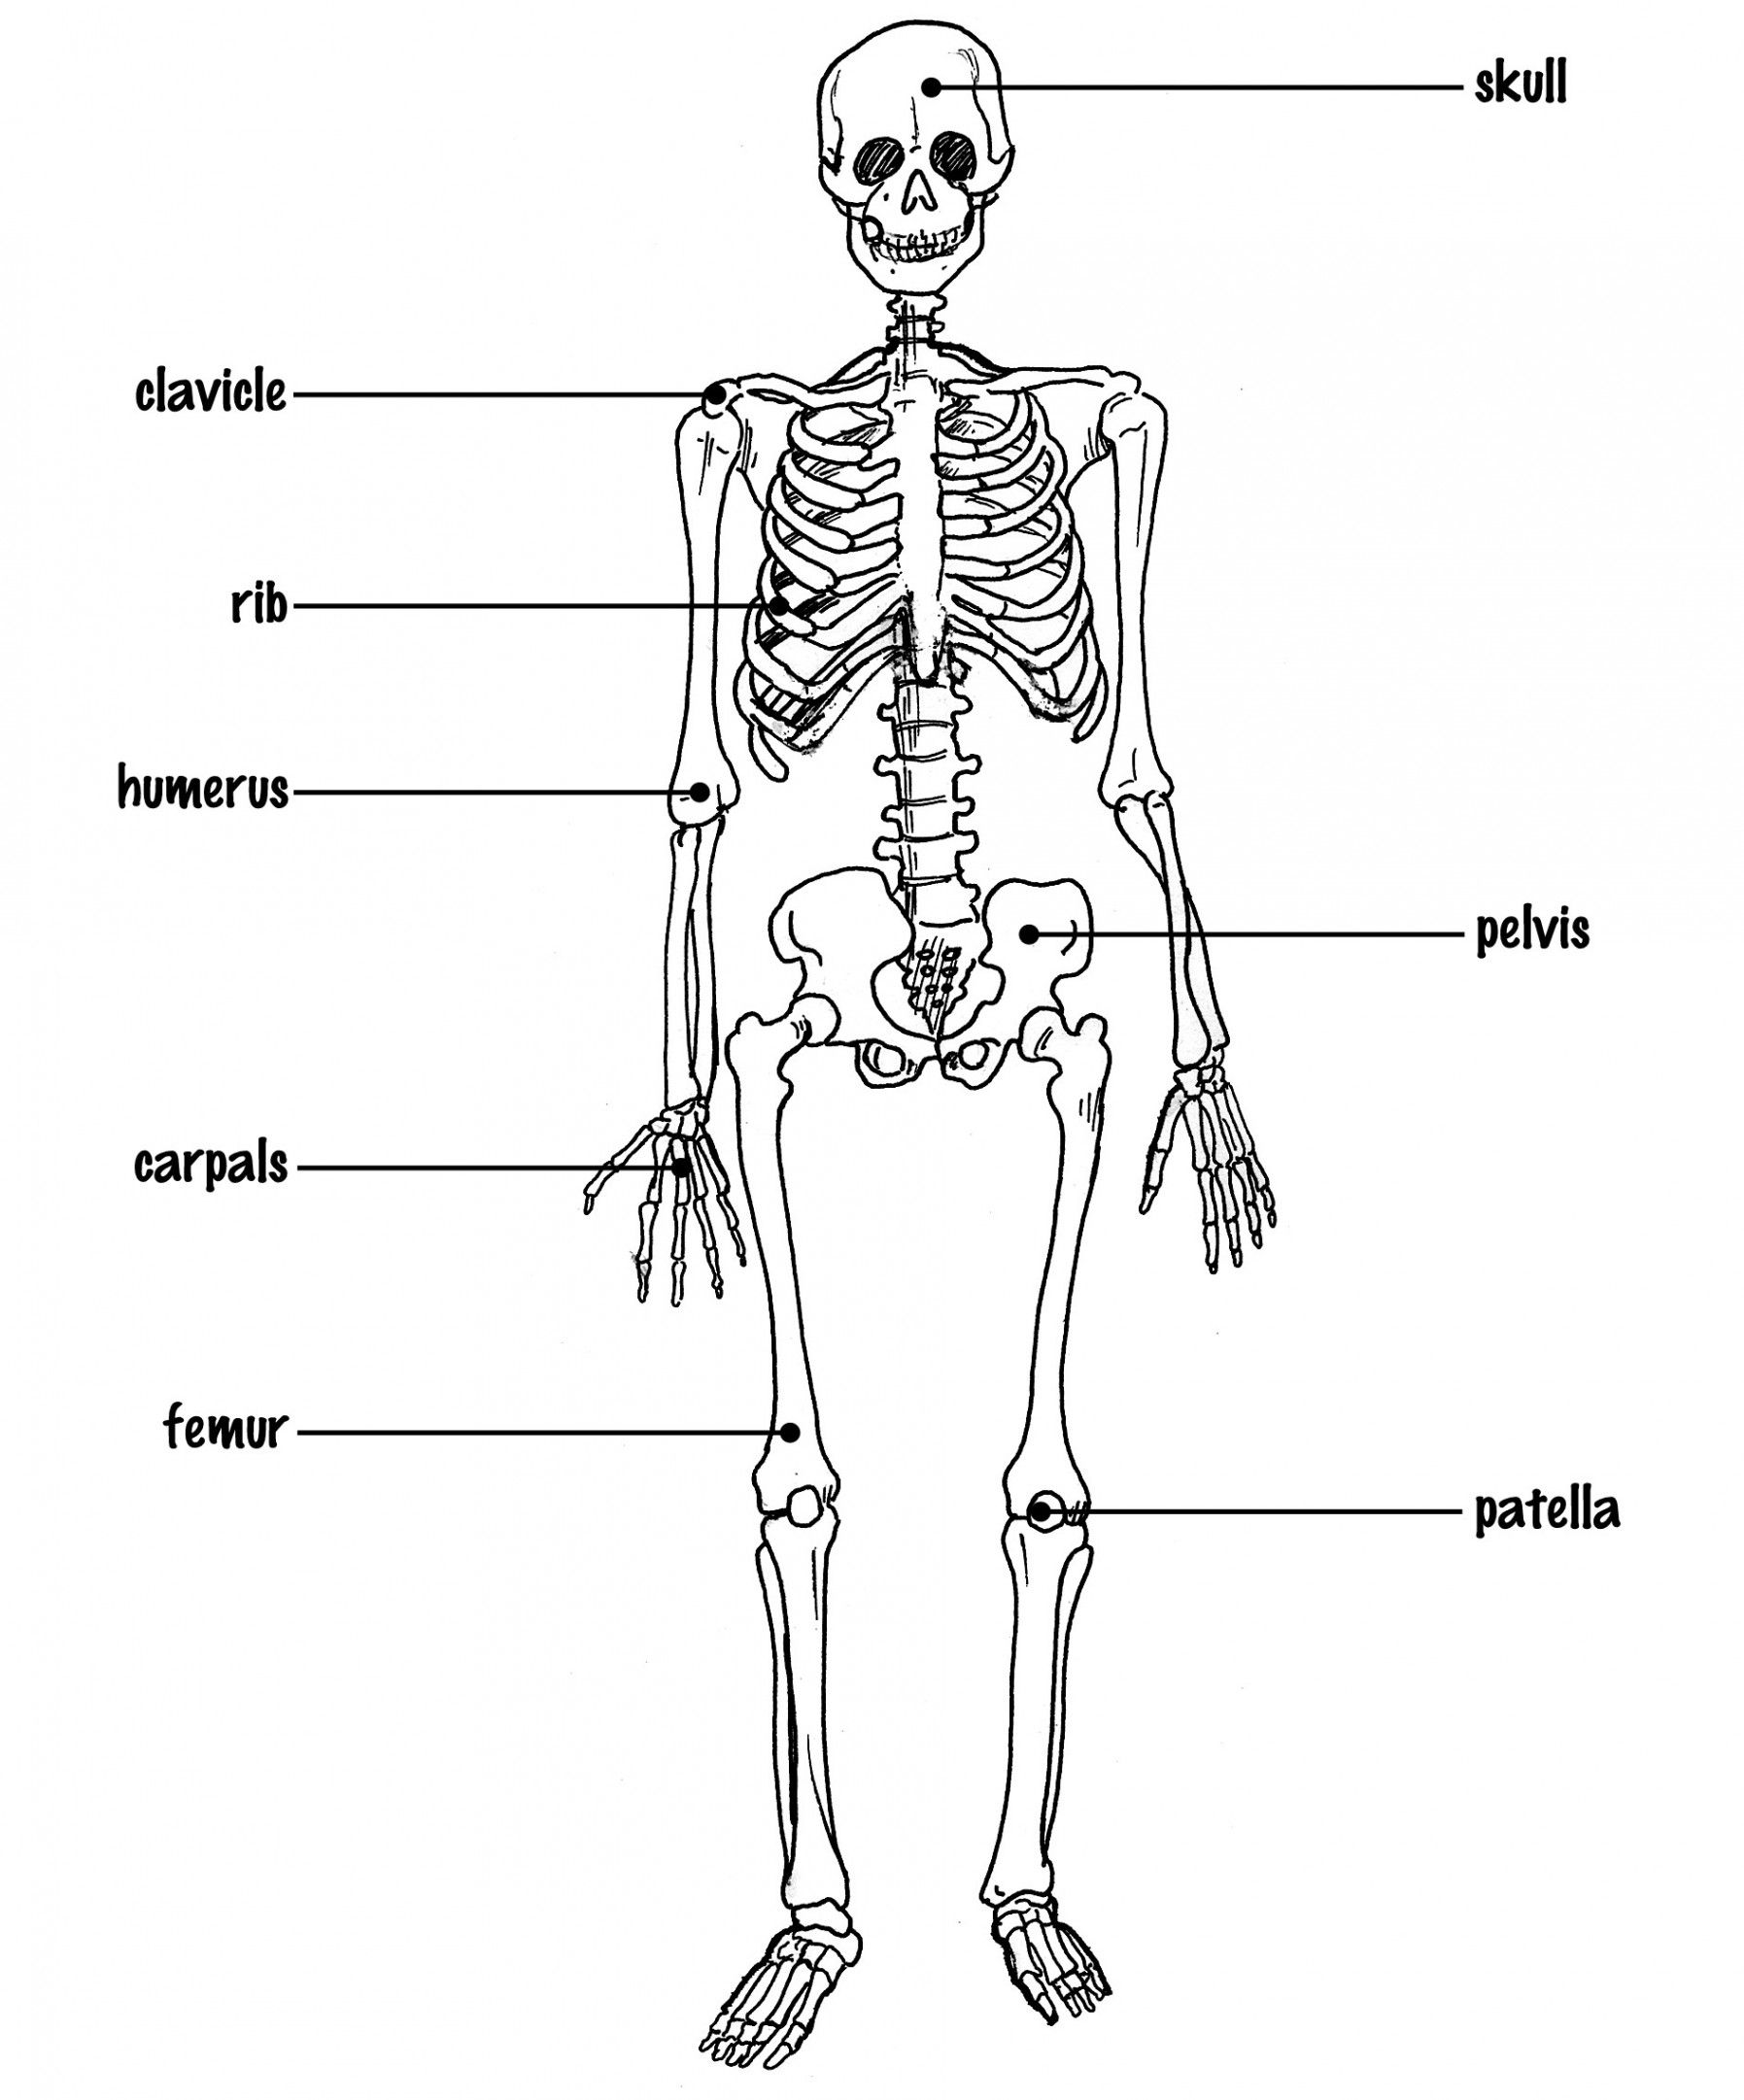 unlabeled human skeleton diagram unlabeled human skeleton diagram blank human skeleton stream the awesome web [ 1795 x 2162 Pixel ]